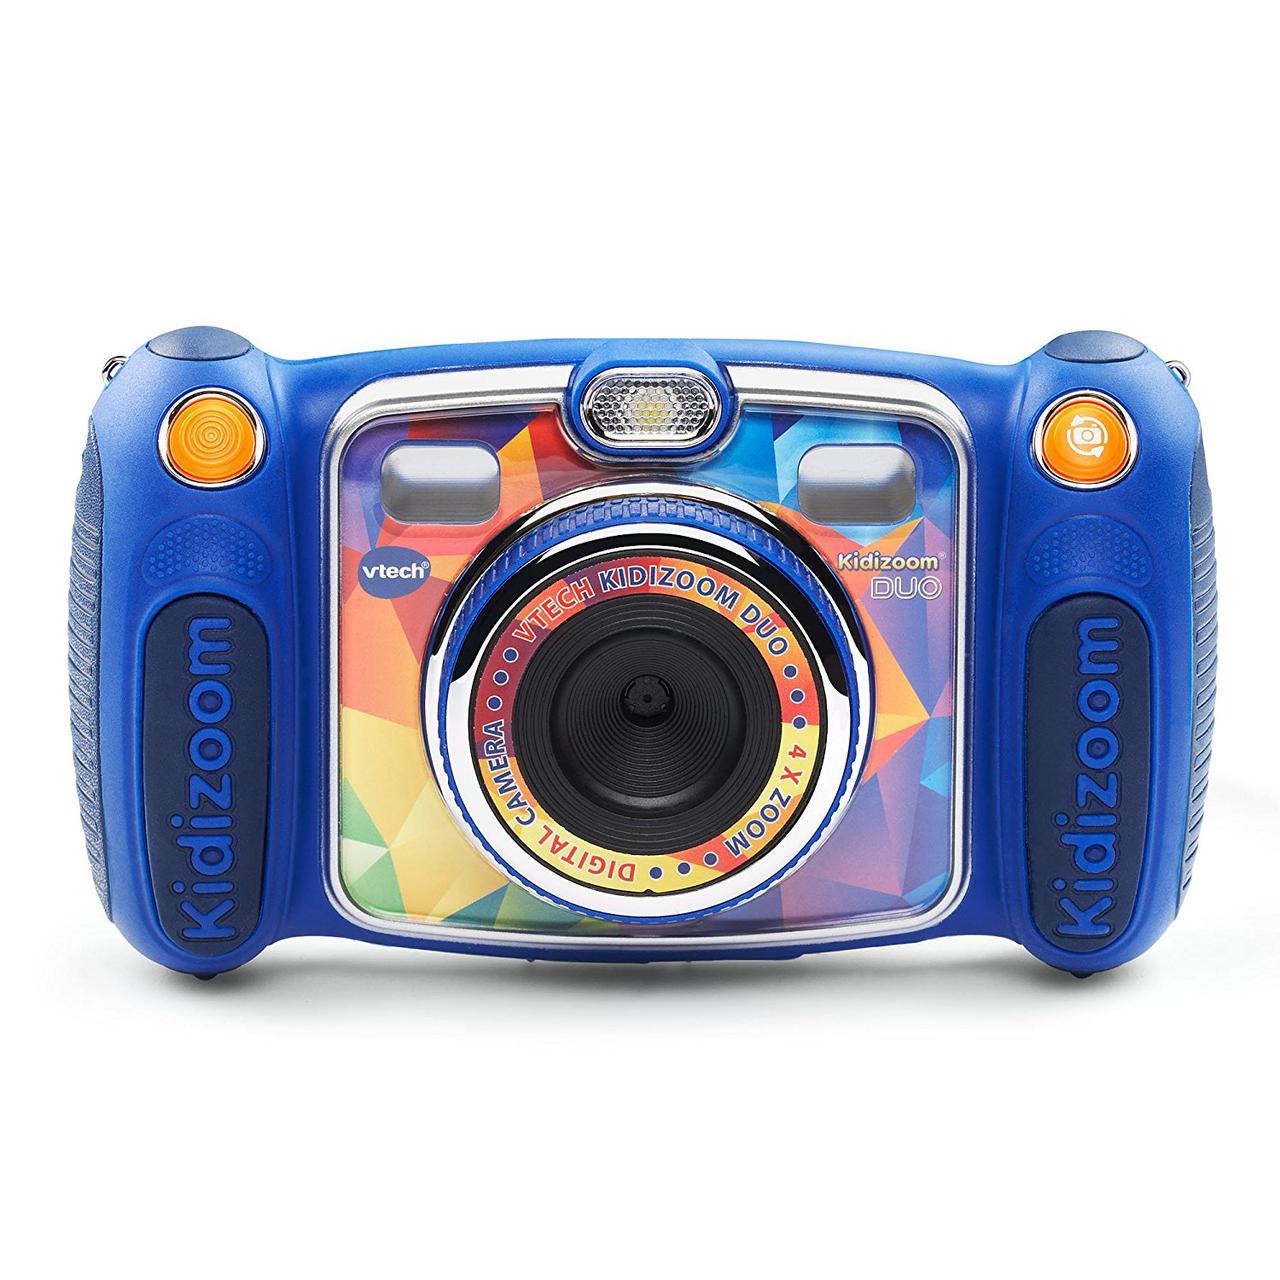 VTech Детский фотоаппарат с видео записью Kidizoom DUO Camera Blue